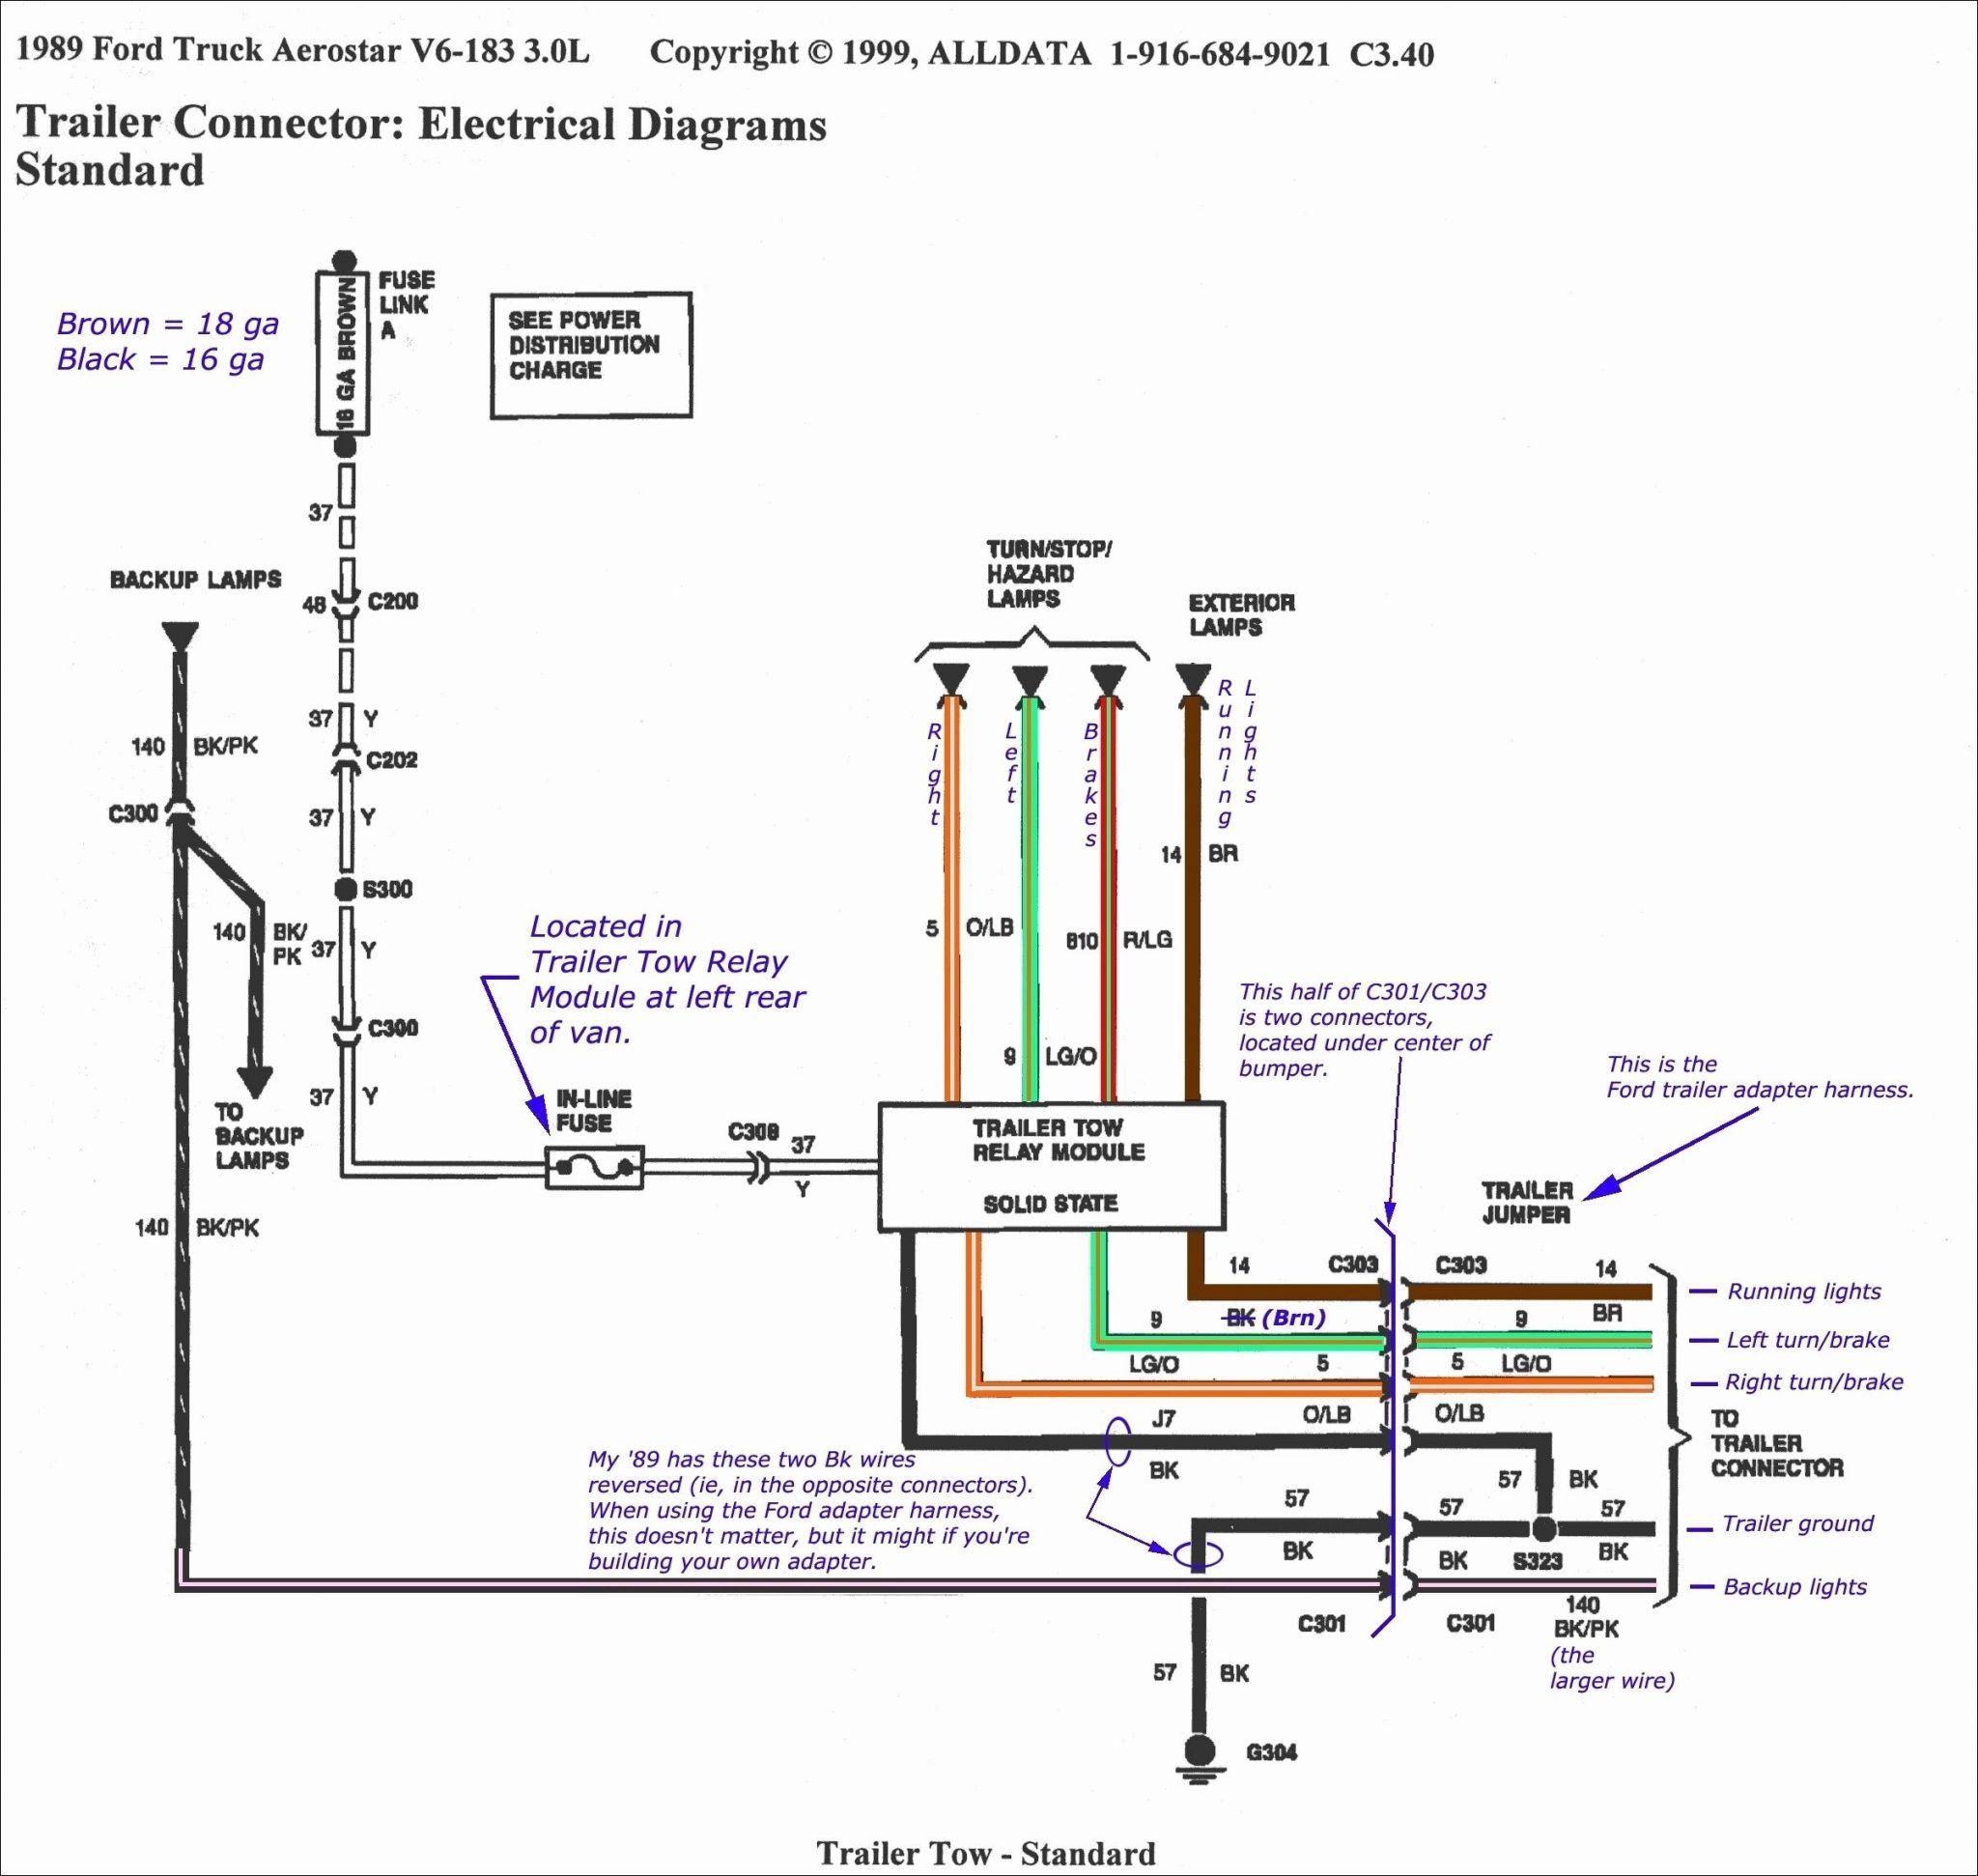 Pop Up Camper Wiring Diagram - Galls Remote Siren Wiring Diagram -  doorchime.tukune.jeanjaures37.fr | Pop Up Camper Wiring Diagram |  | Wiring Diagram Resource